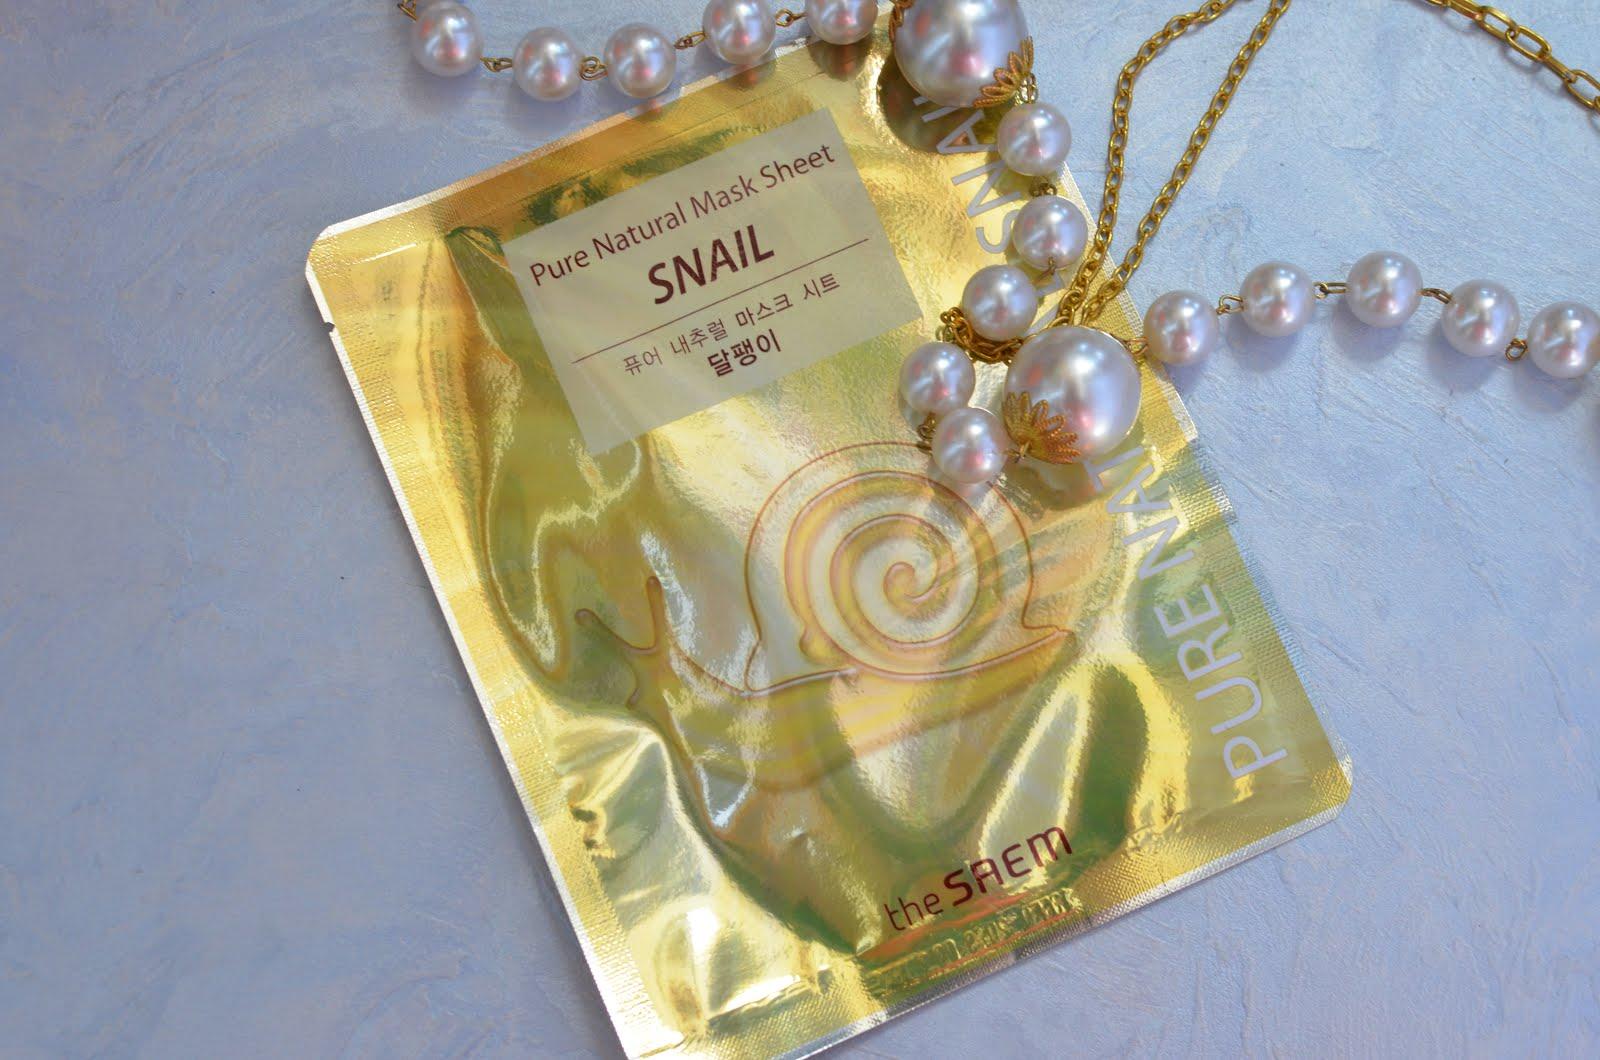 The Saem Pure Natural Mask Sheet Snail Тканевая маска с фильтратом улиточной слизи